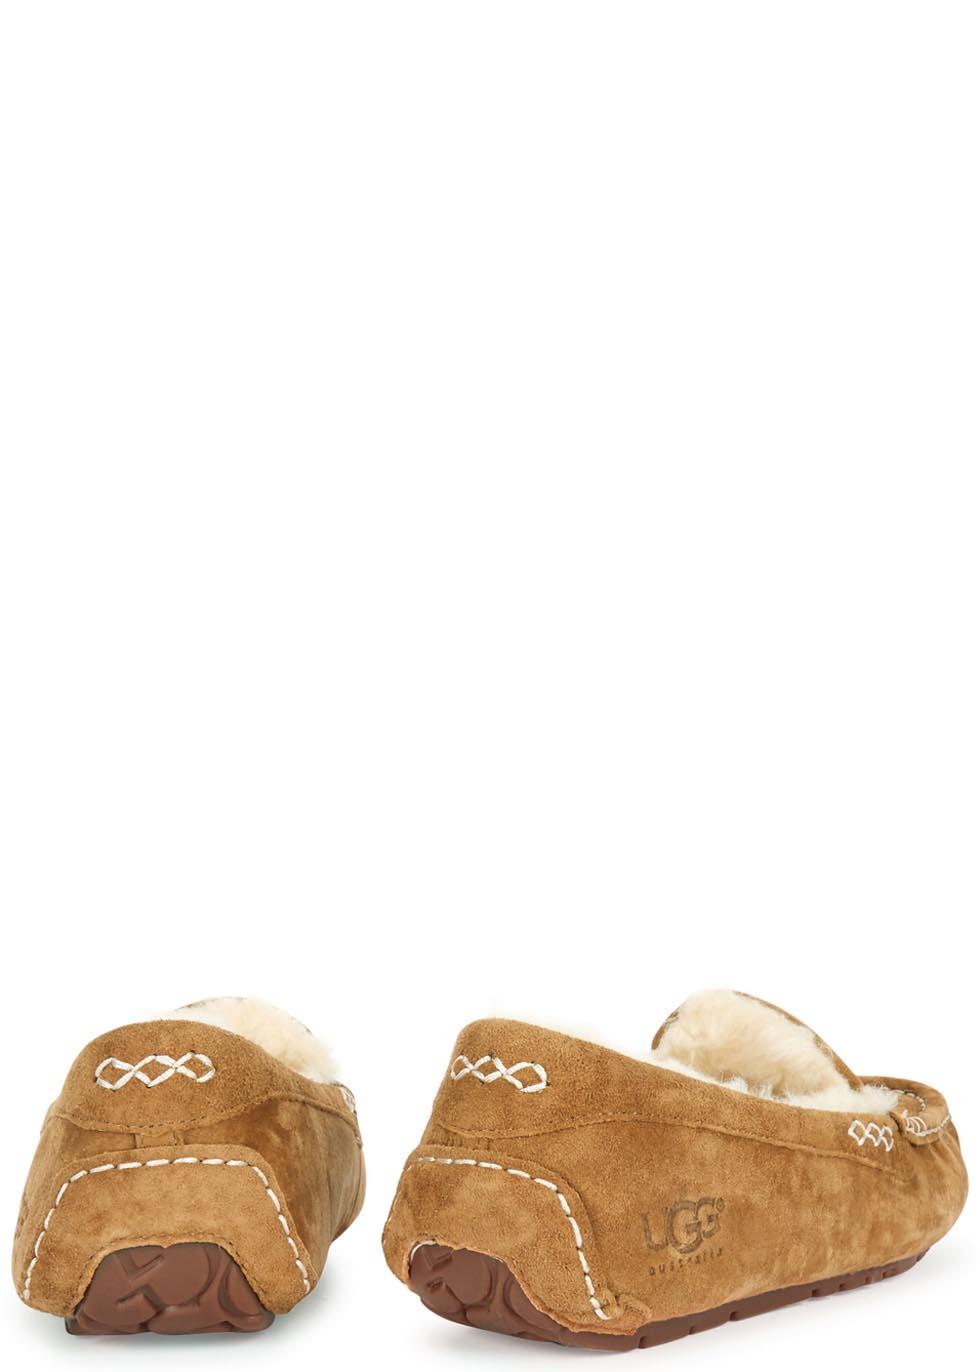 Ansley chestnut suede slippers - UGG